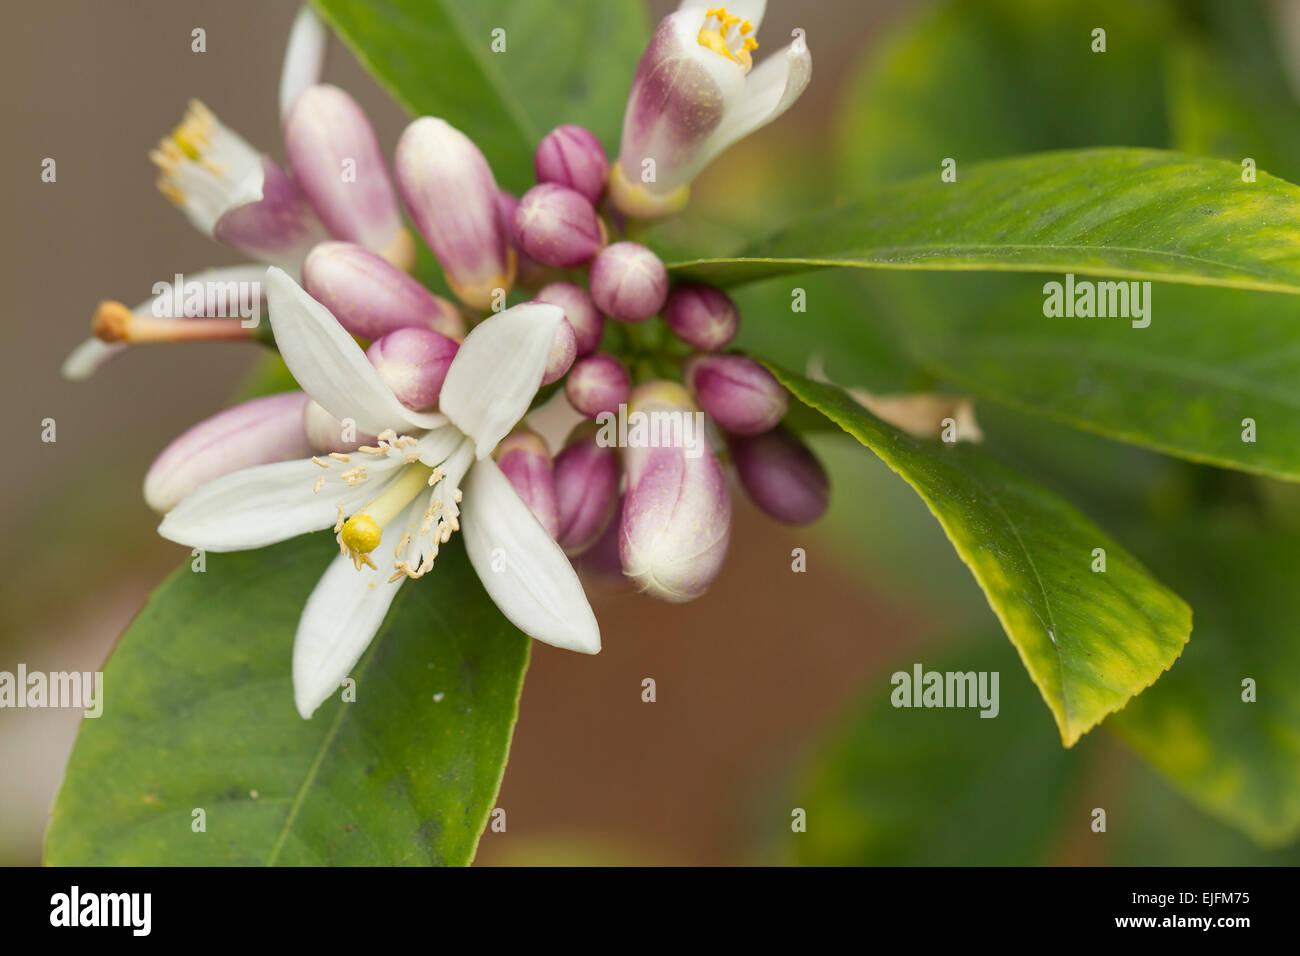 Lemon Tree Flowers Blooming In Spring Stock Photo 80250441 Alamy